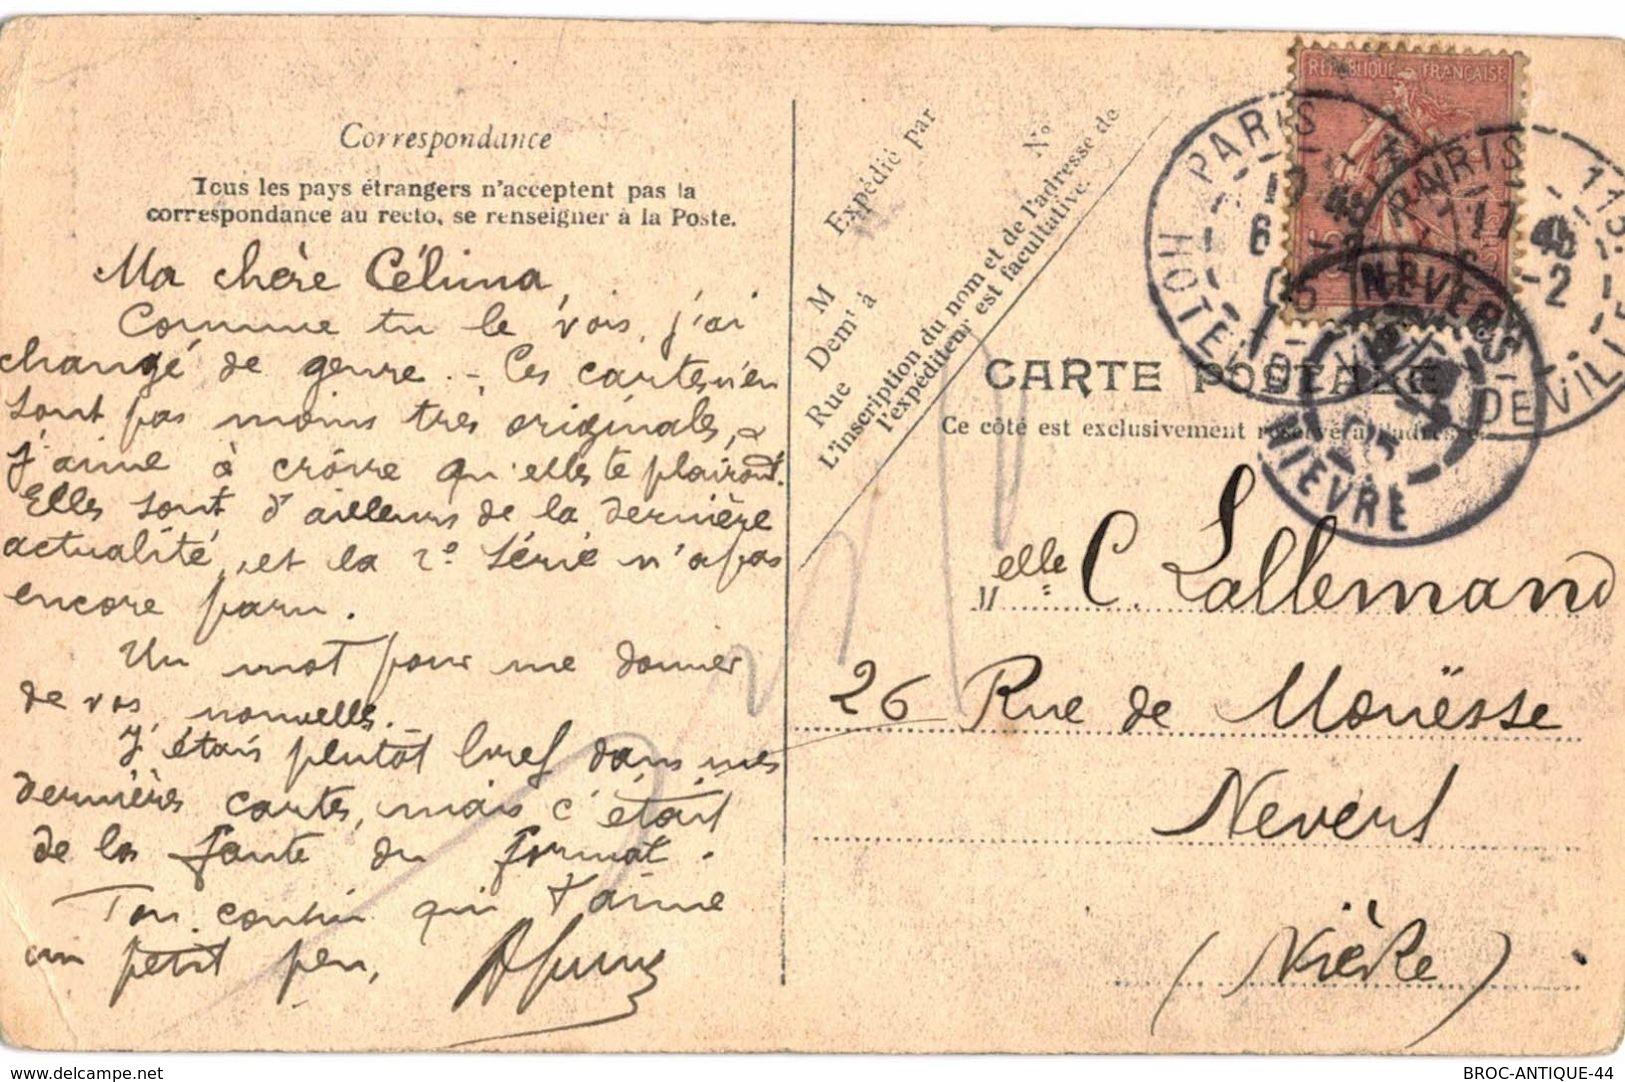 CPA N°9189 - LOT DE 2 CARTES GENERAL ANDRE + PELLETAN CAMILLE - DESSIN SATYRIQUE - COLLECTION GUIGNOL - G. LAPLAGNE - Künstlerkarten